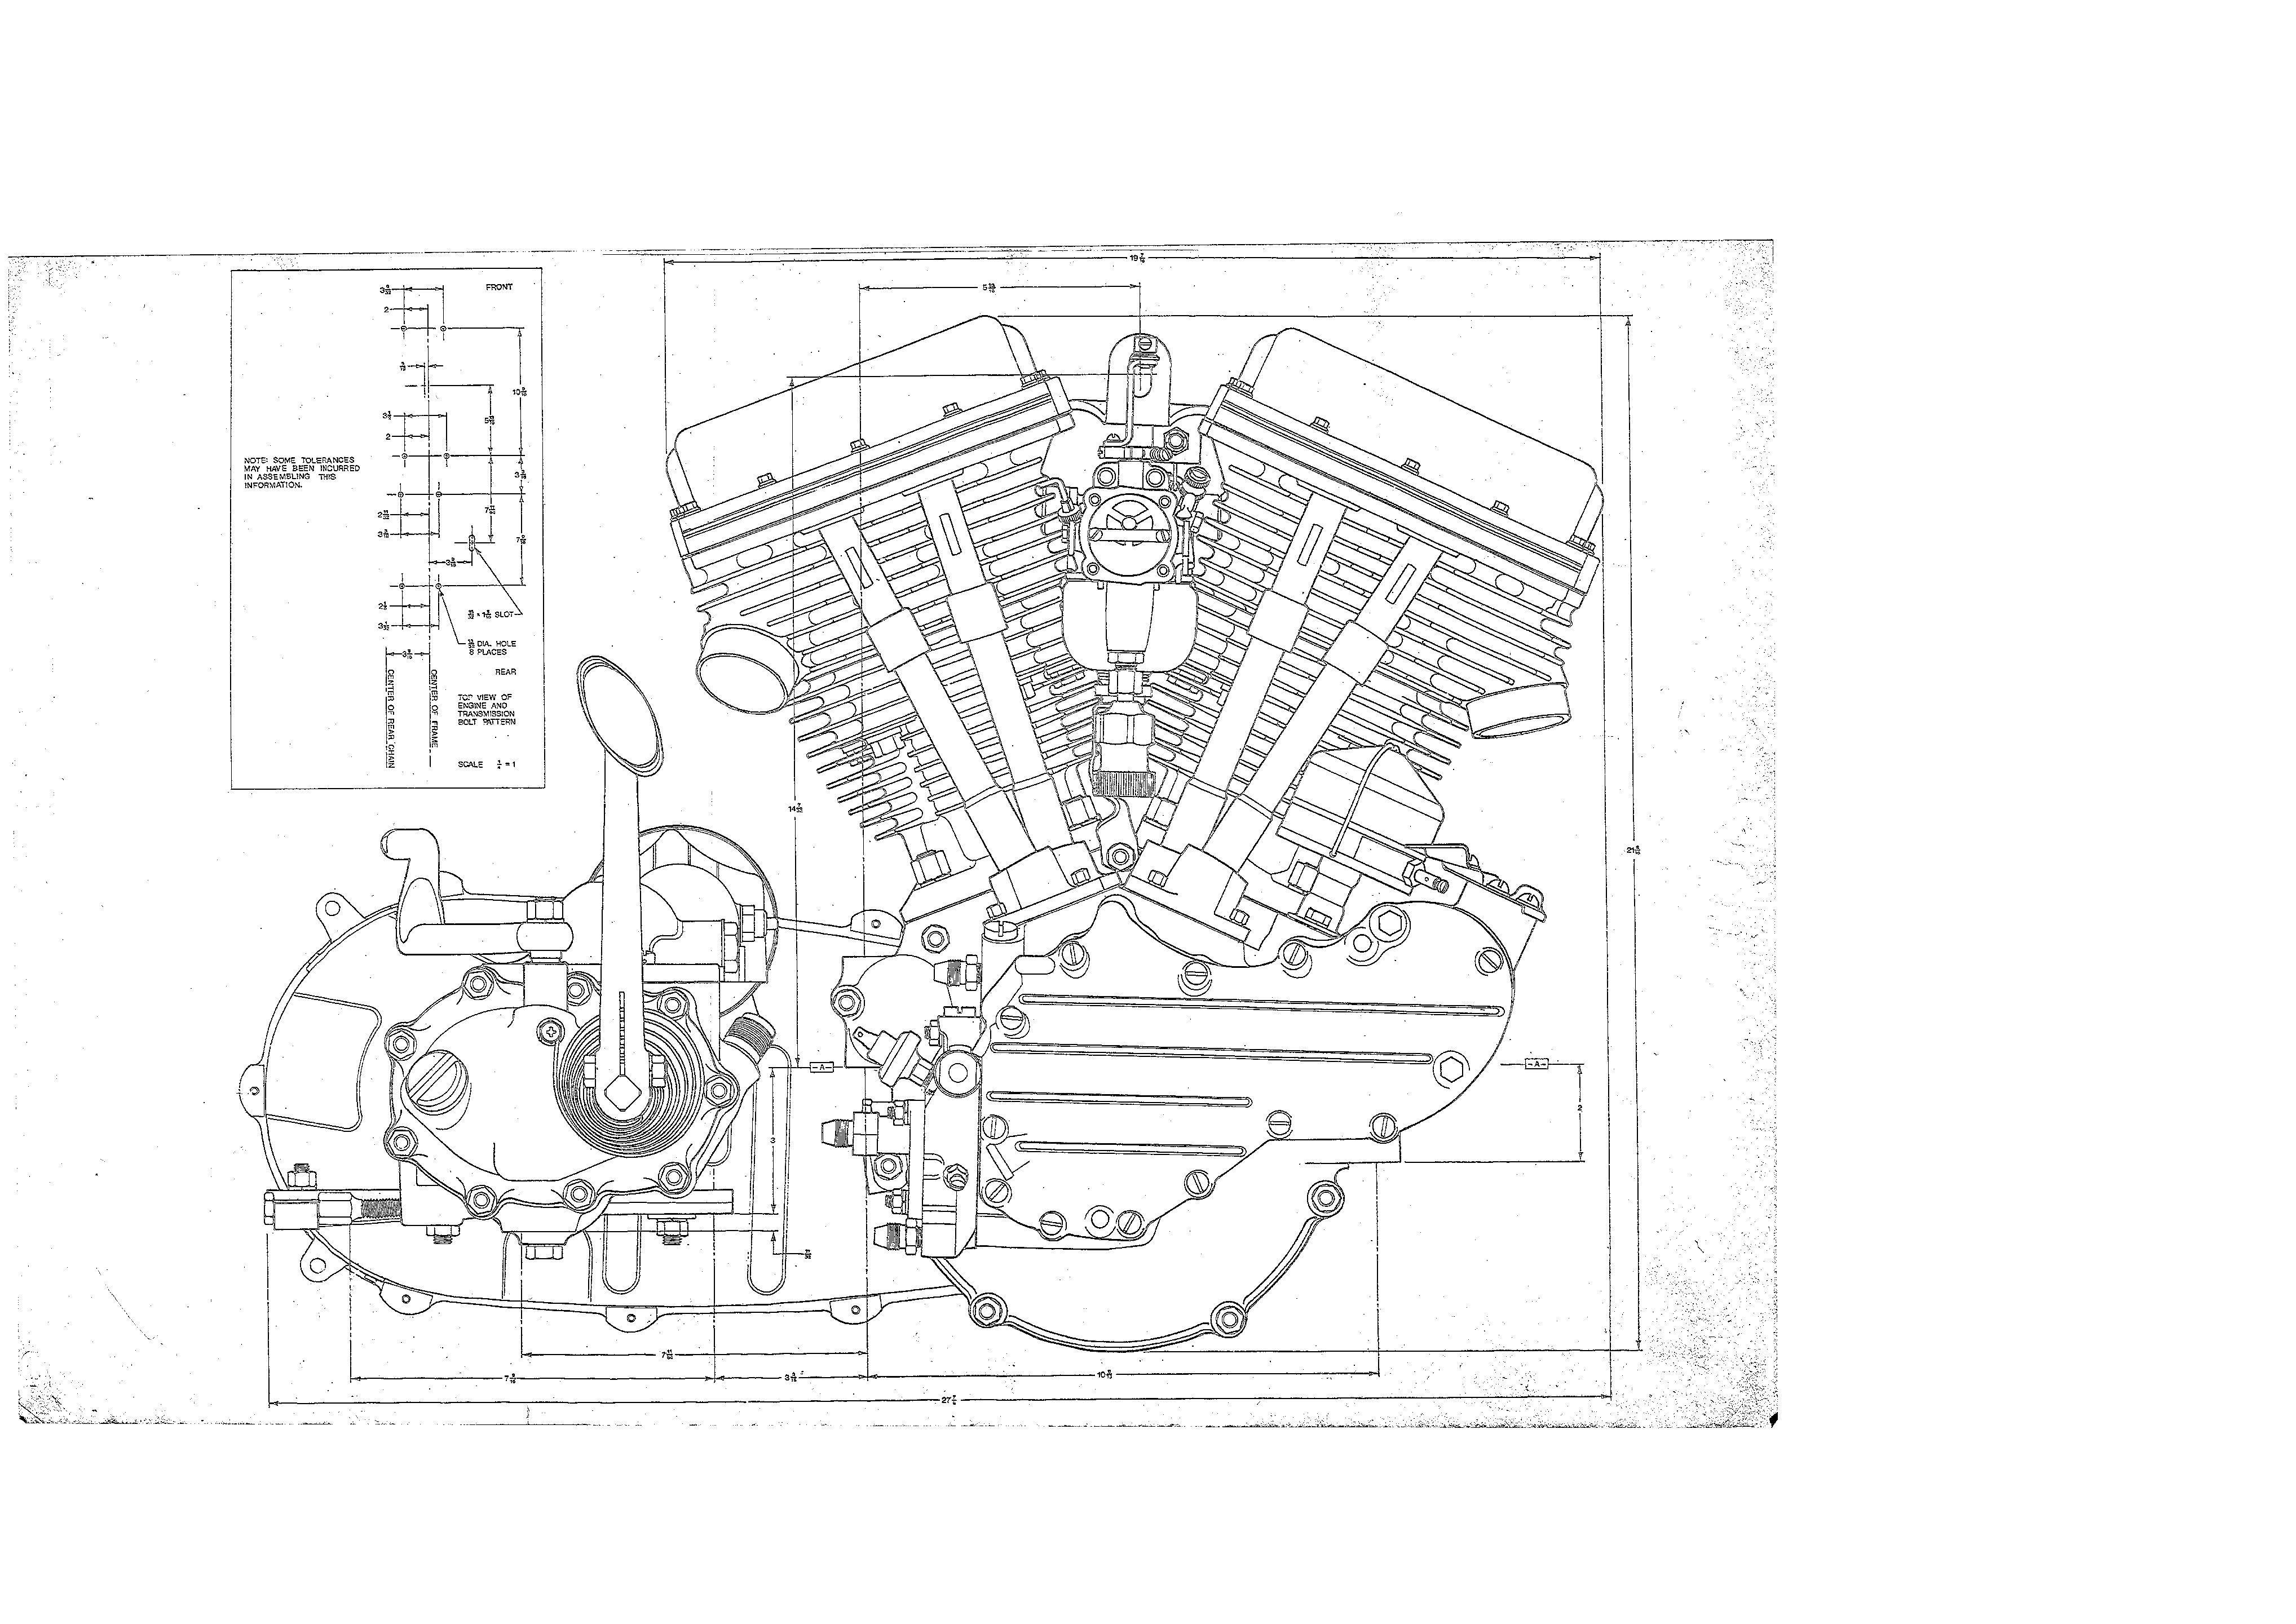 Harley Engine Diagram Line Drawing additionally Honda Gl 1500 Wiring Diagram as well 50 Ccscrambler 1990 Wiring Diagram moreover Wiring Diagram 2003 Honda Vtx 1800 besides Honda Cb125s Chilton Electrical Wiring Diagram. on free wiring diagrams for honda motorcycles